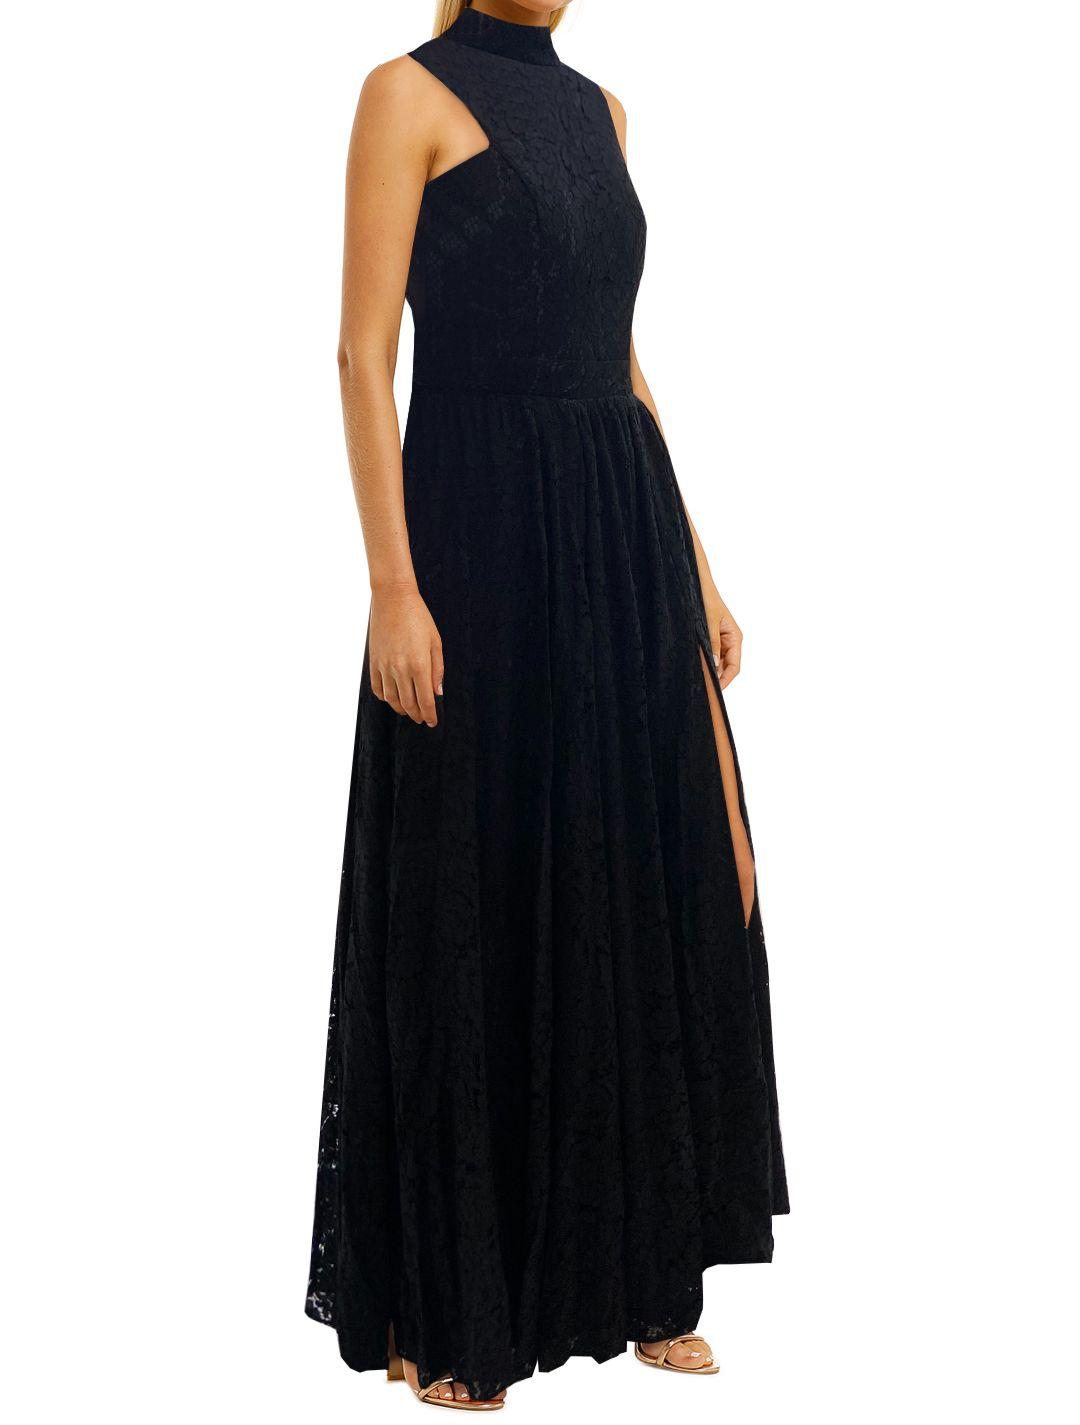 Fame-and-Partners-Tabitha-Dress-Black-Lace-Maxi-Dress-Side